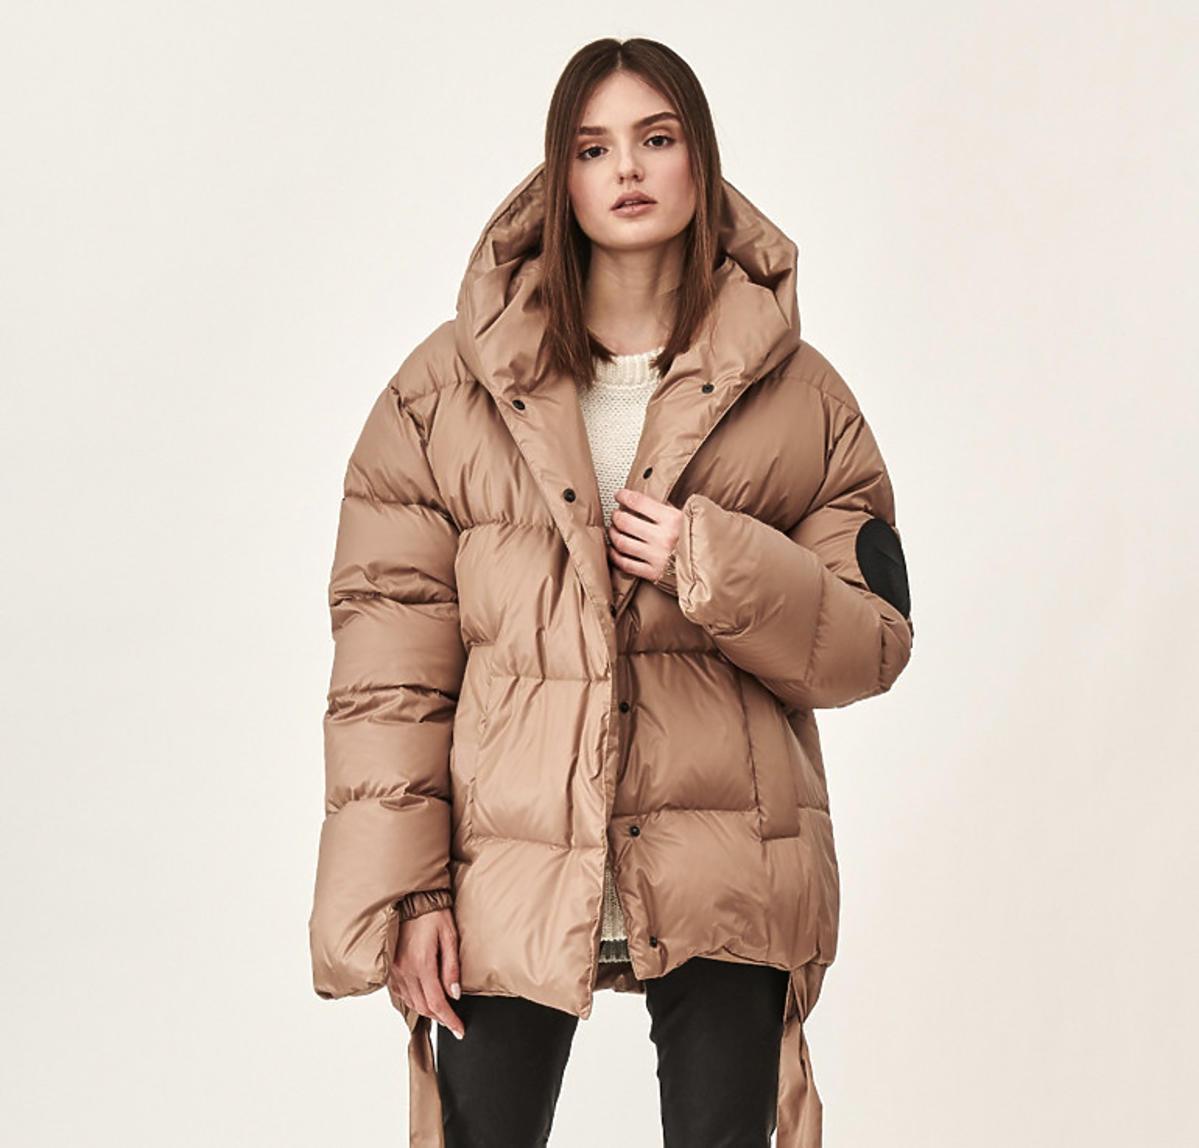 MMC, puchowa kurtka za 2500 zł